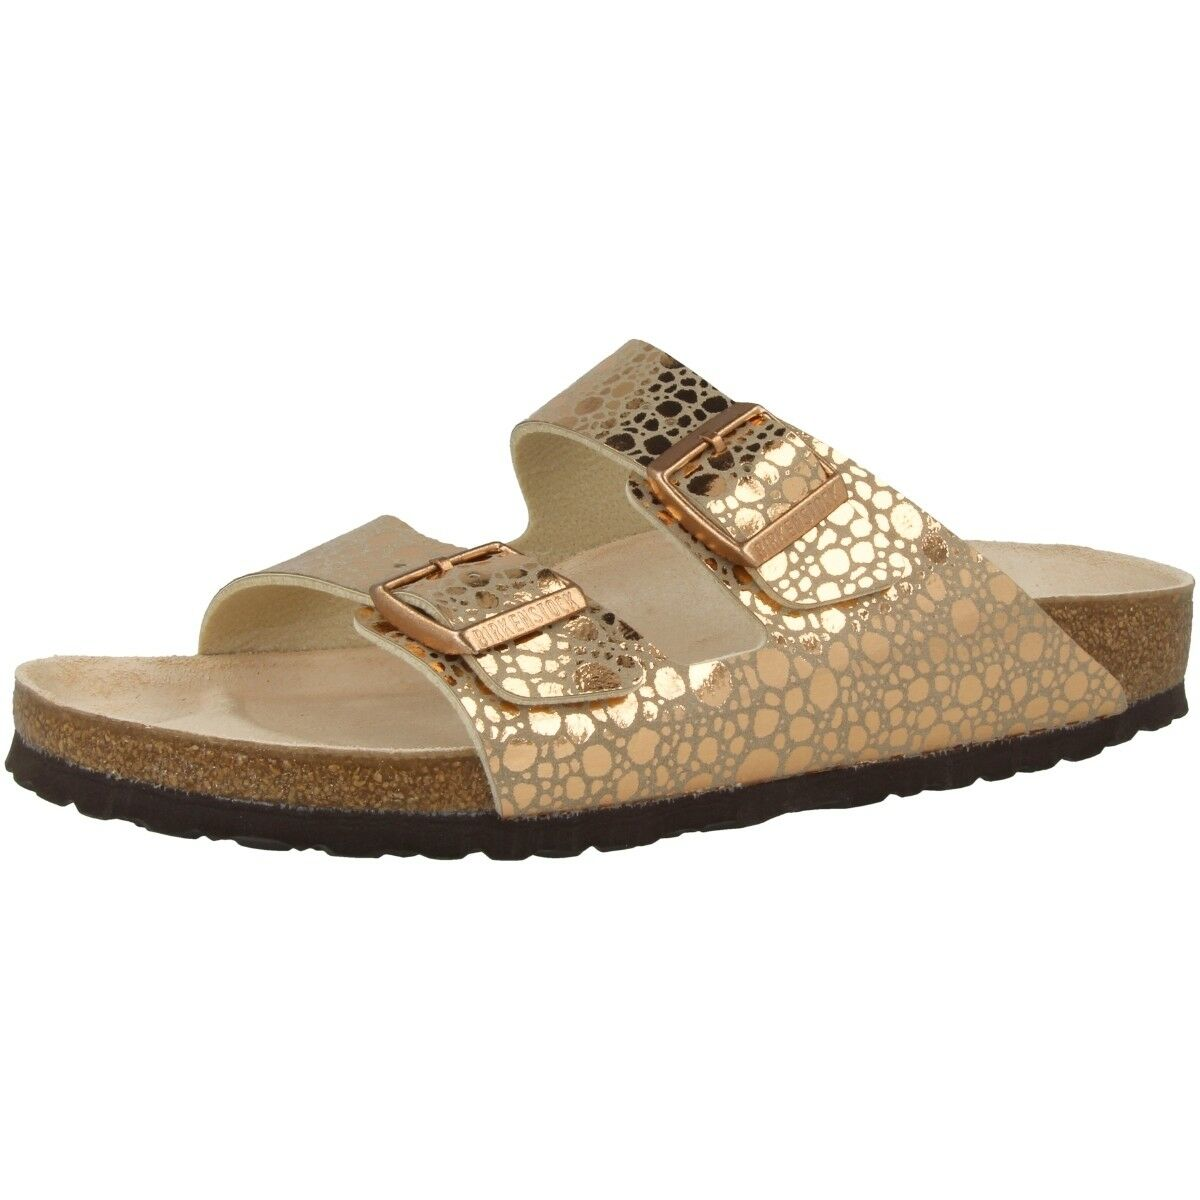 Birkenstock Arizona Birko-Flor Schuhe Sandale Metallic Weite schmal 1006685